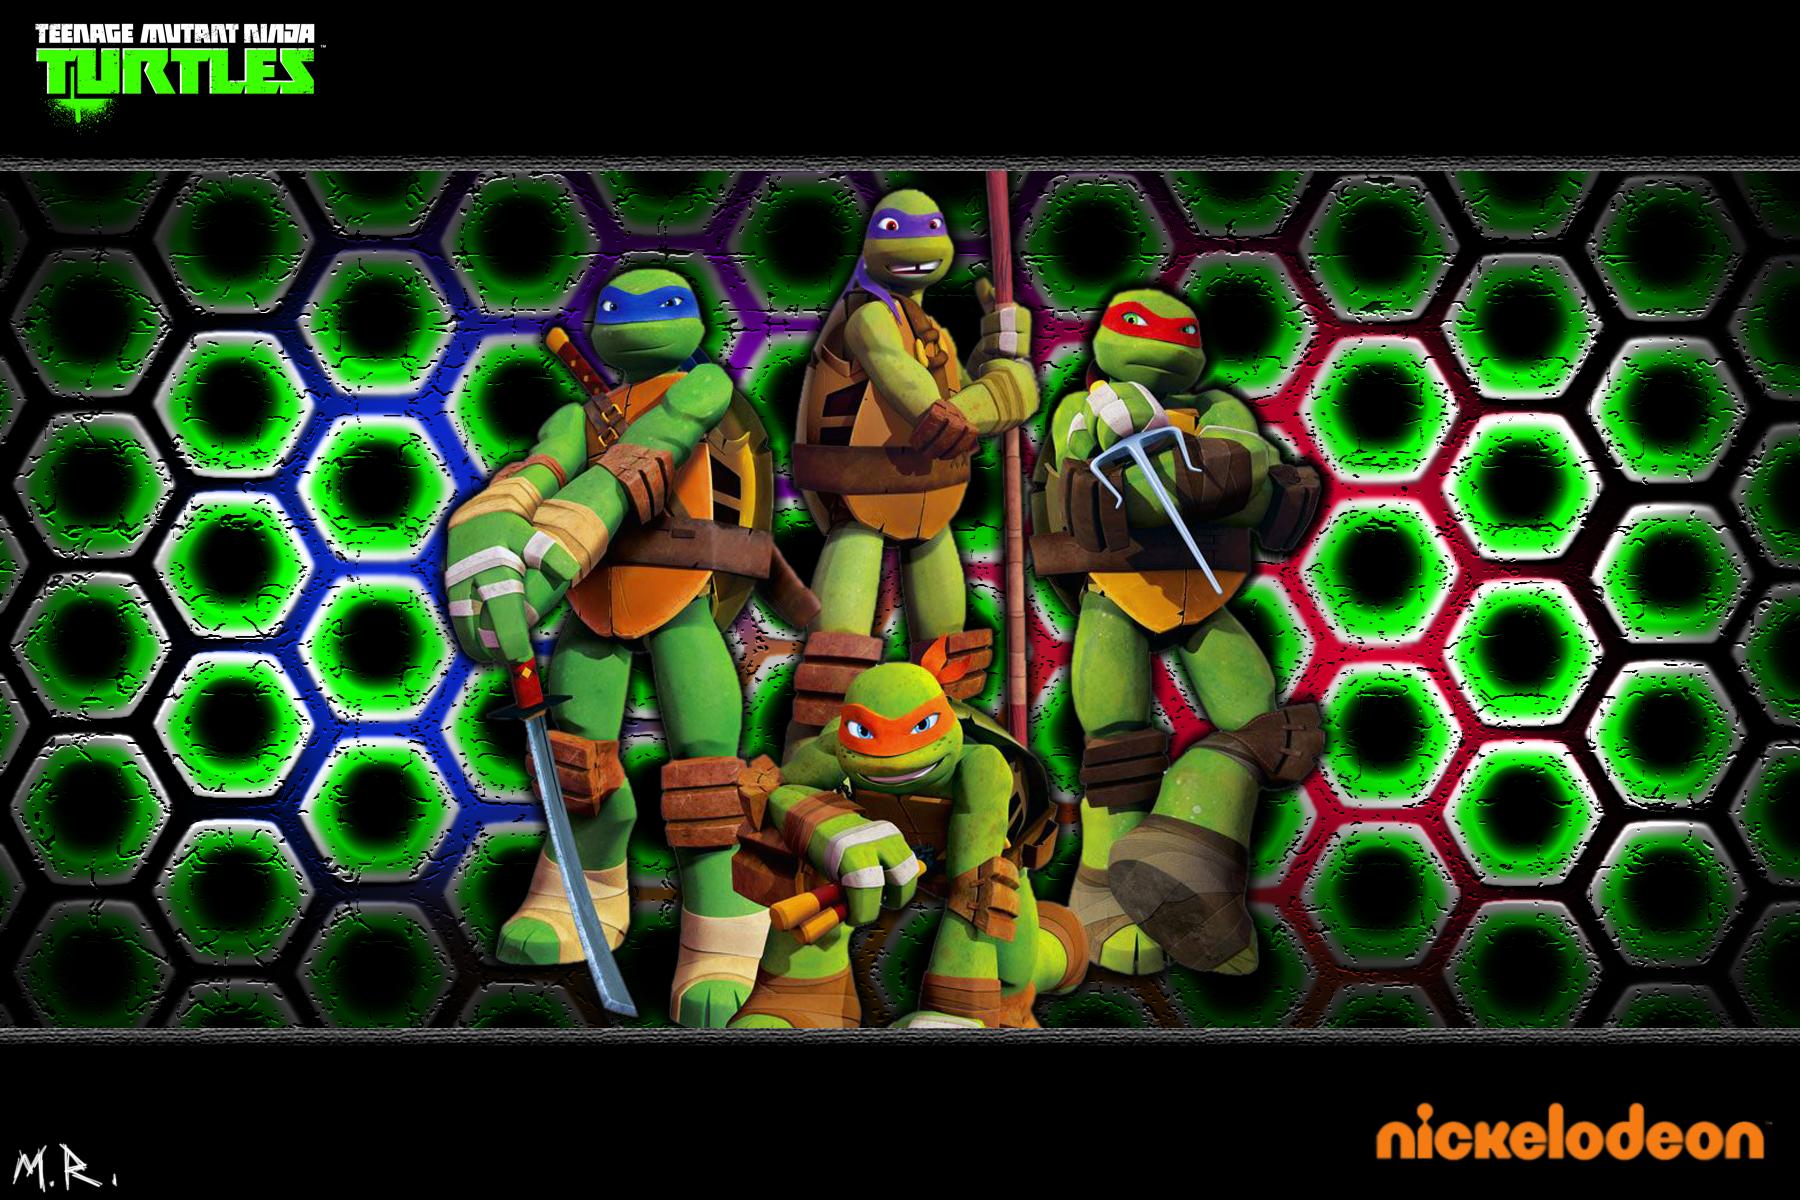 2012 Nickelodeon TMNT Wallpaper by ShadowNinja976 1800x1200